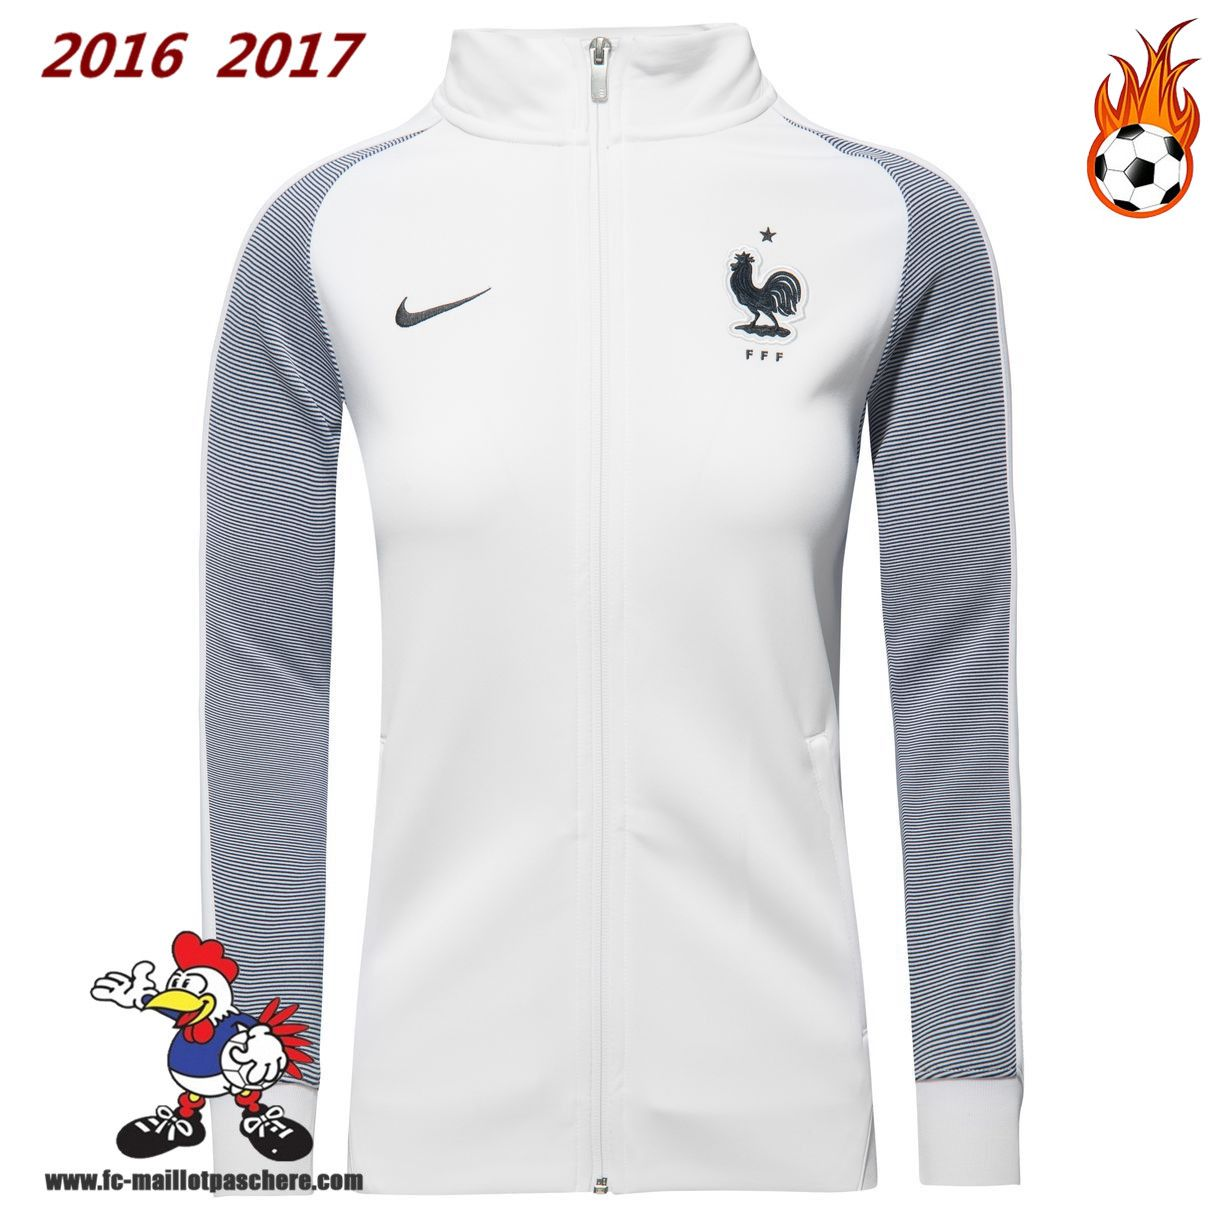 Veste Nike Homme PSG Noir Tops 2017 2018 Replica Pas Cher